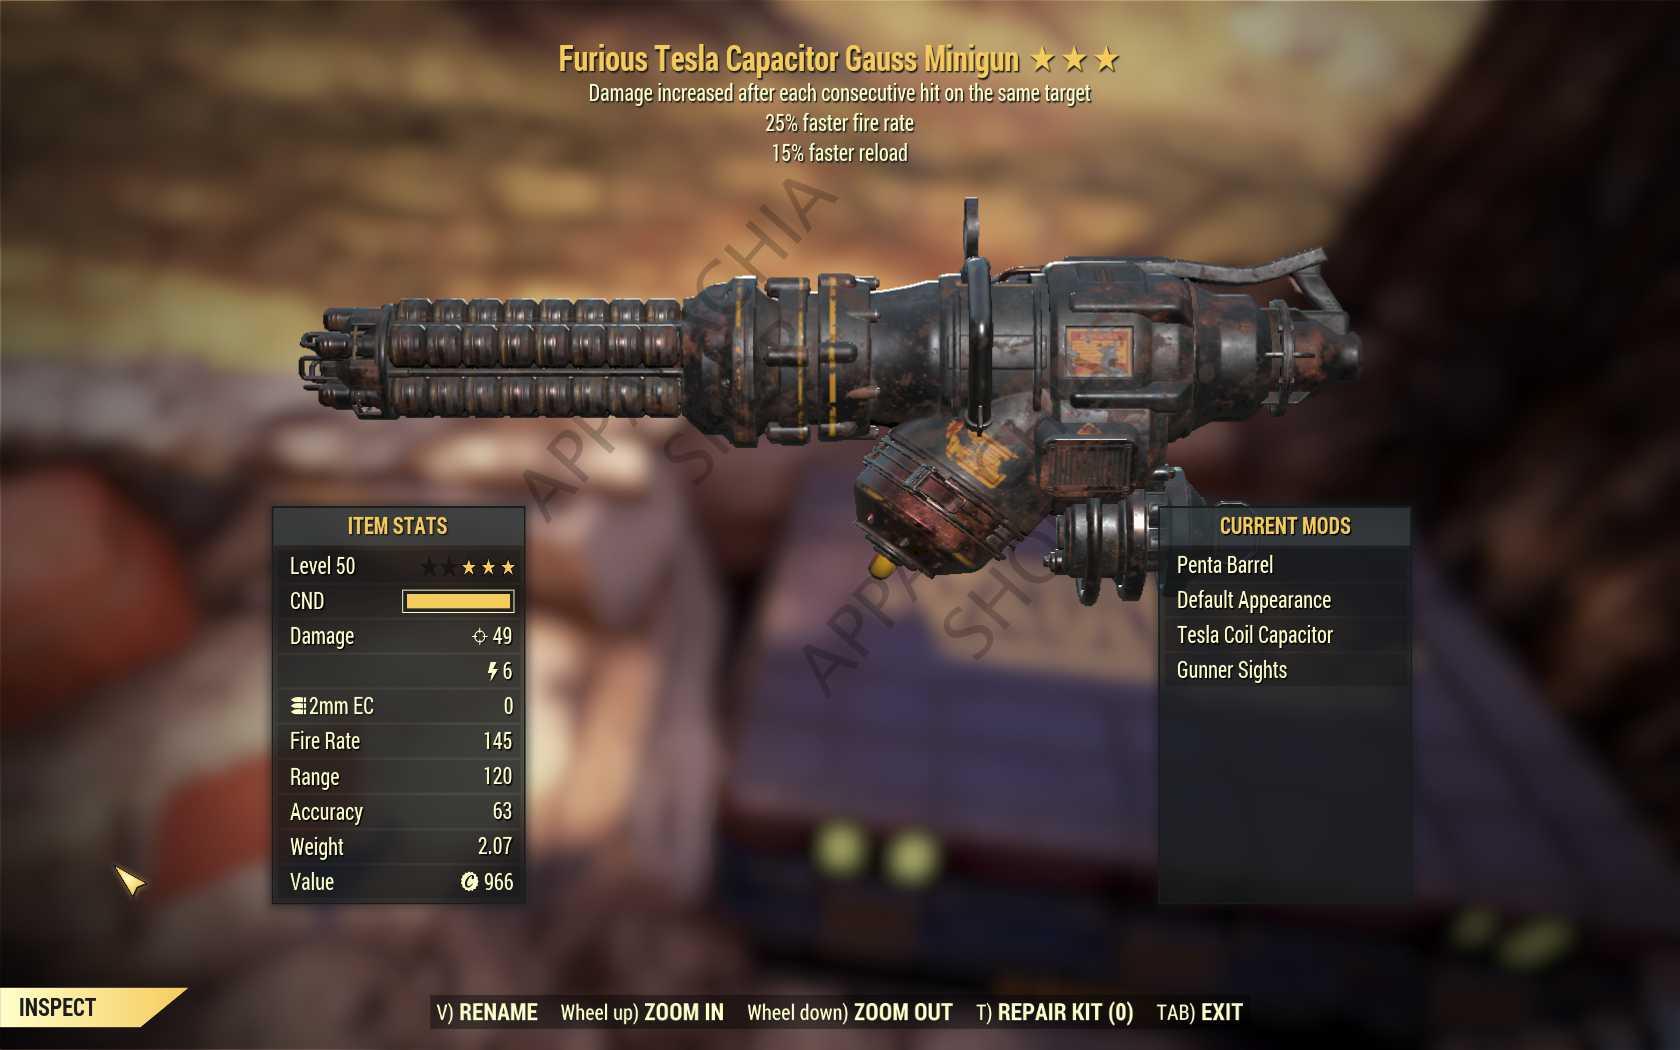 Furious Gauss Minigun (25% faster fire rate, 15% faster reload) FULL MODDED [Wastelanders]